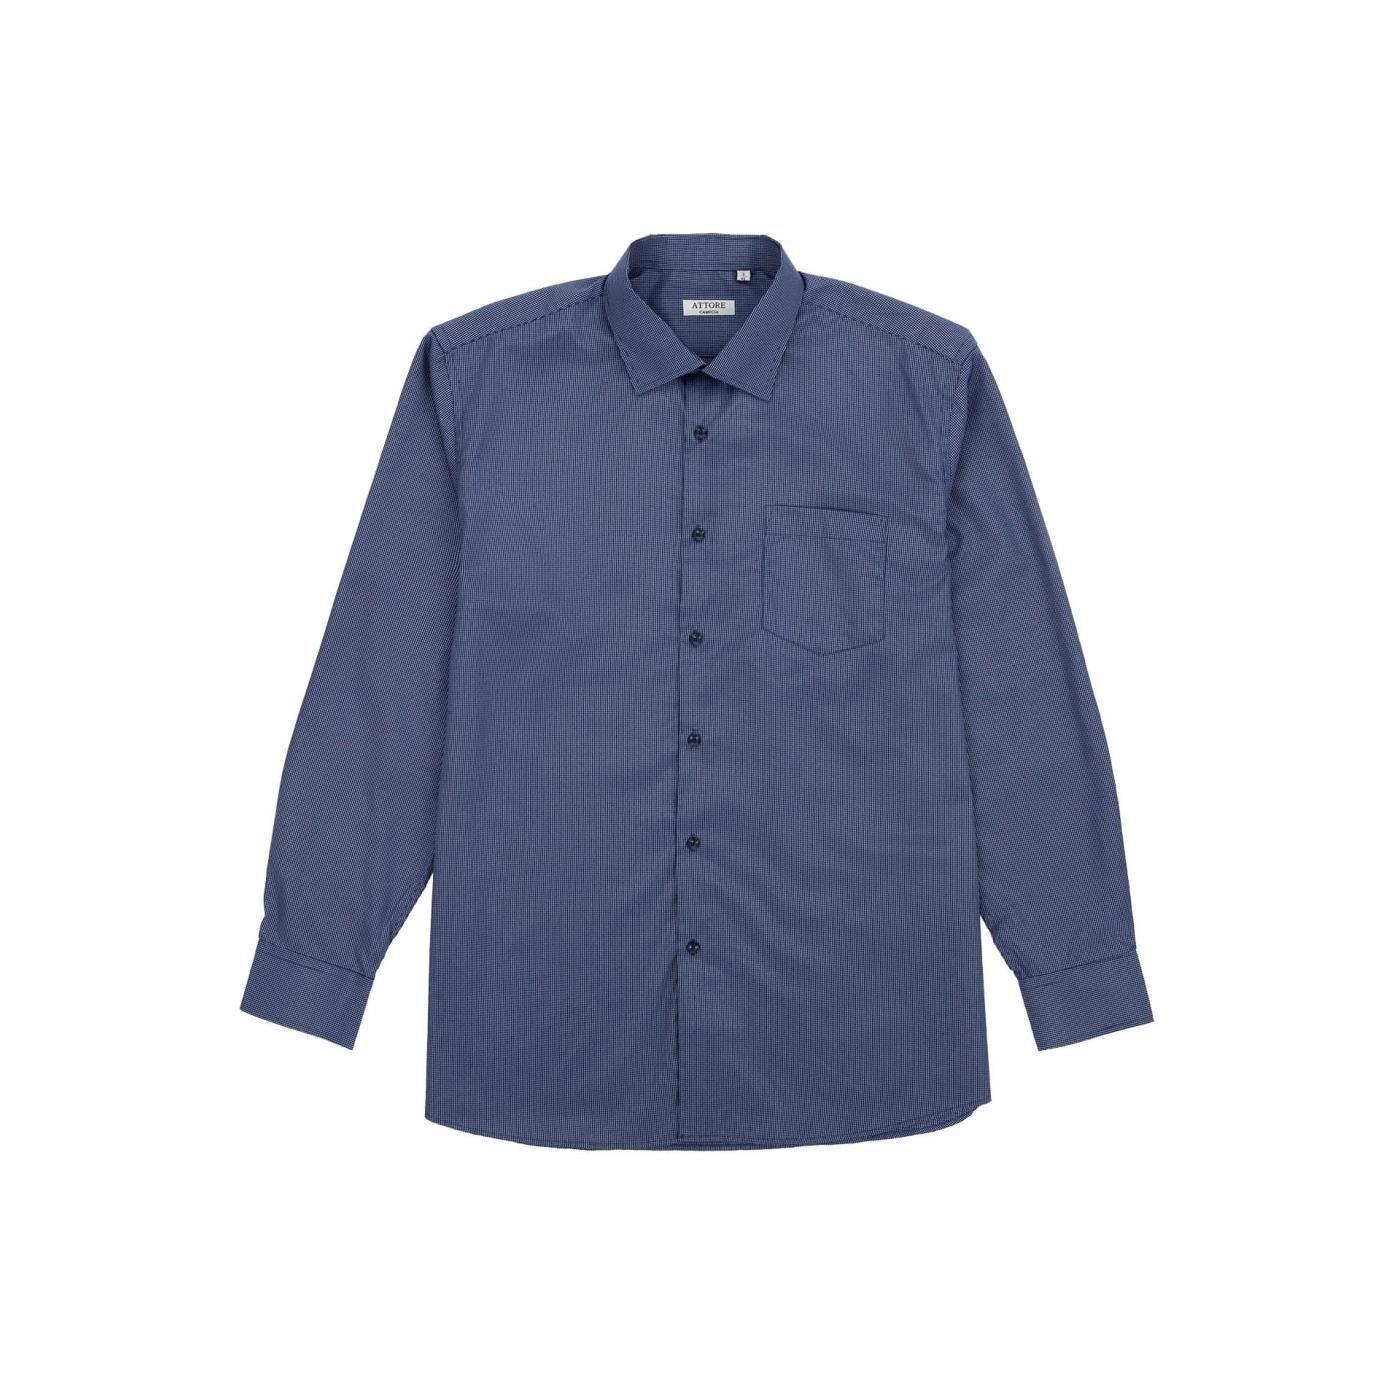 Celestino Ανδρικό καρό πουκάμισο  - Μπλε - Grootte: 46